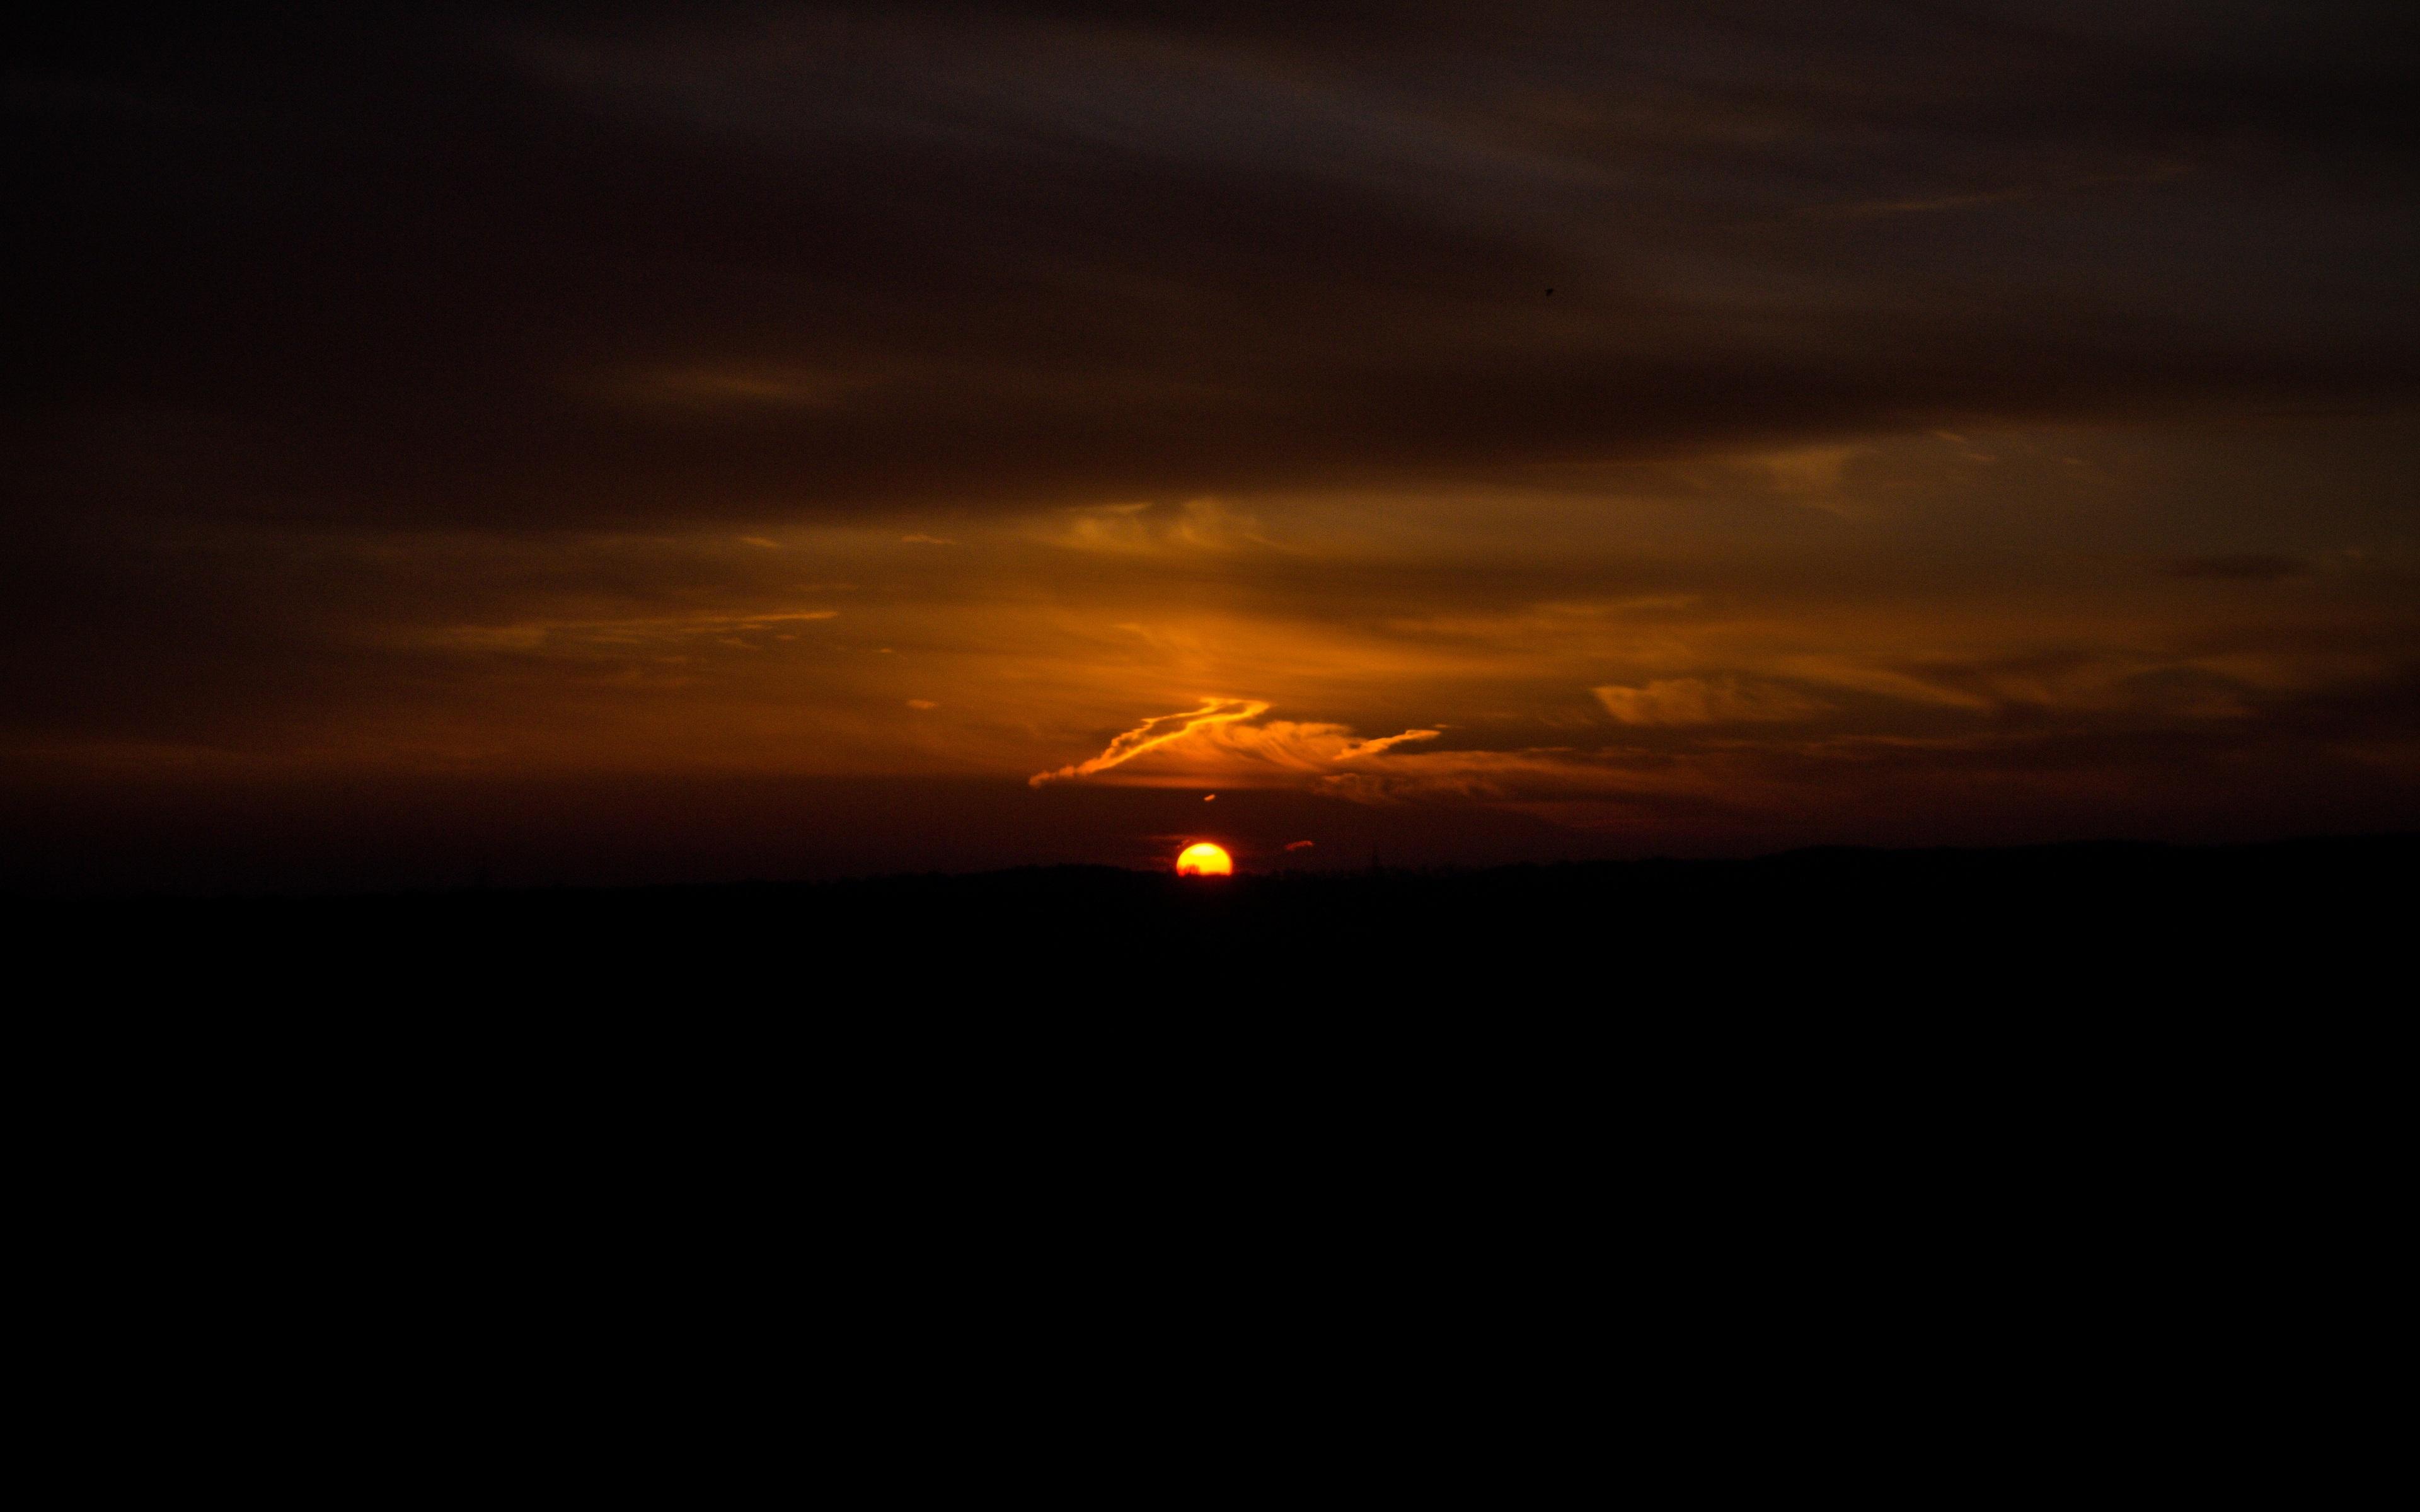 dark-sunset-evening-4k-bc.jpg